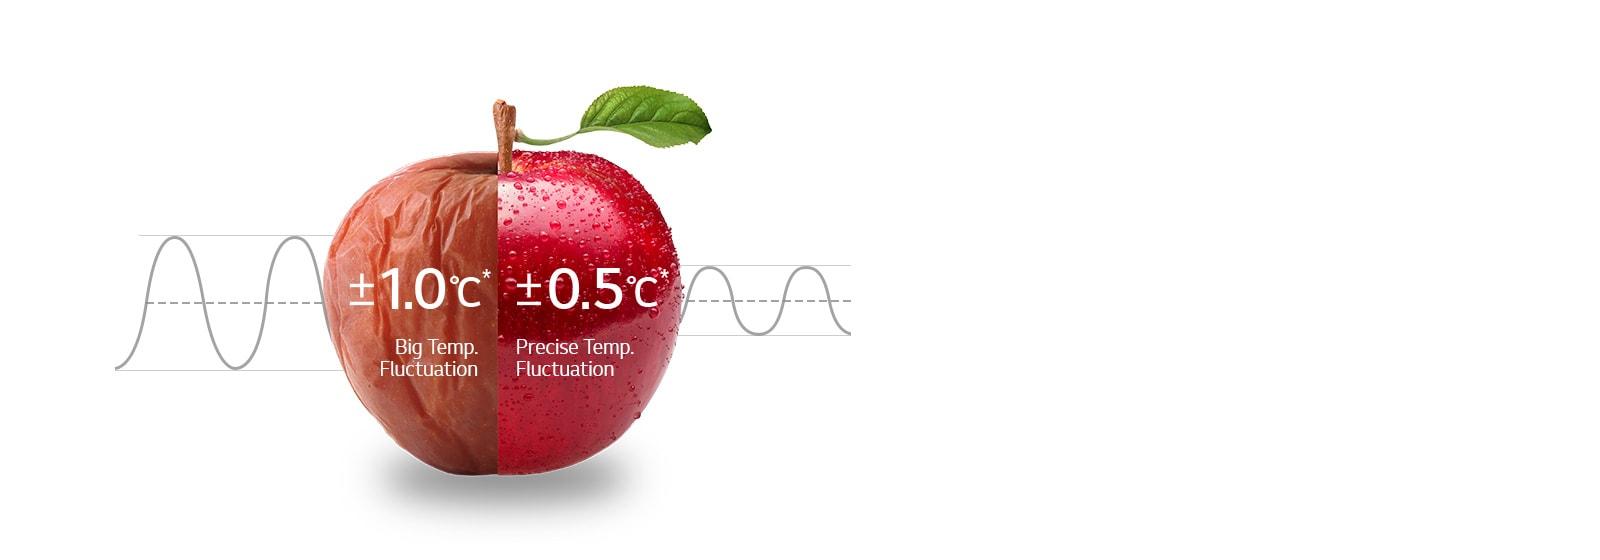 REF-Next8-PlatinumSilver-02-5-LinearCooling-Desktop